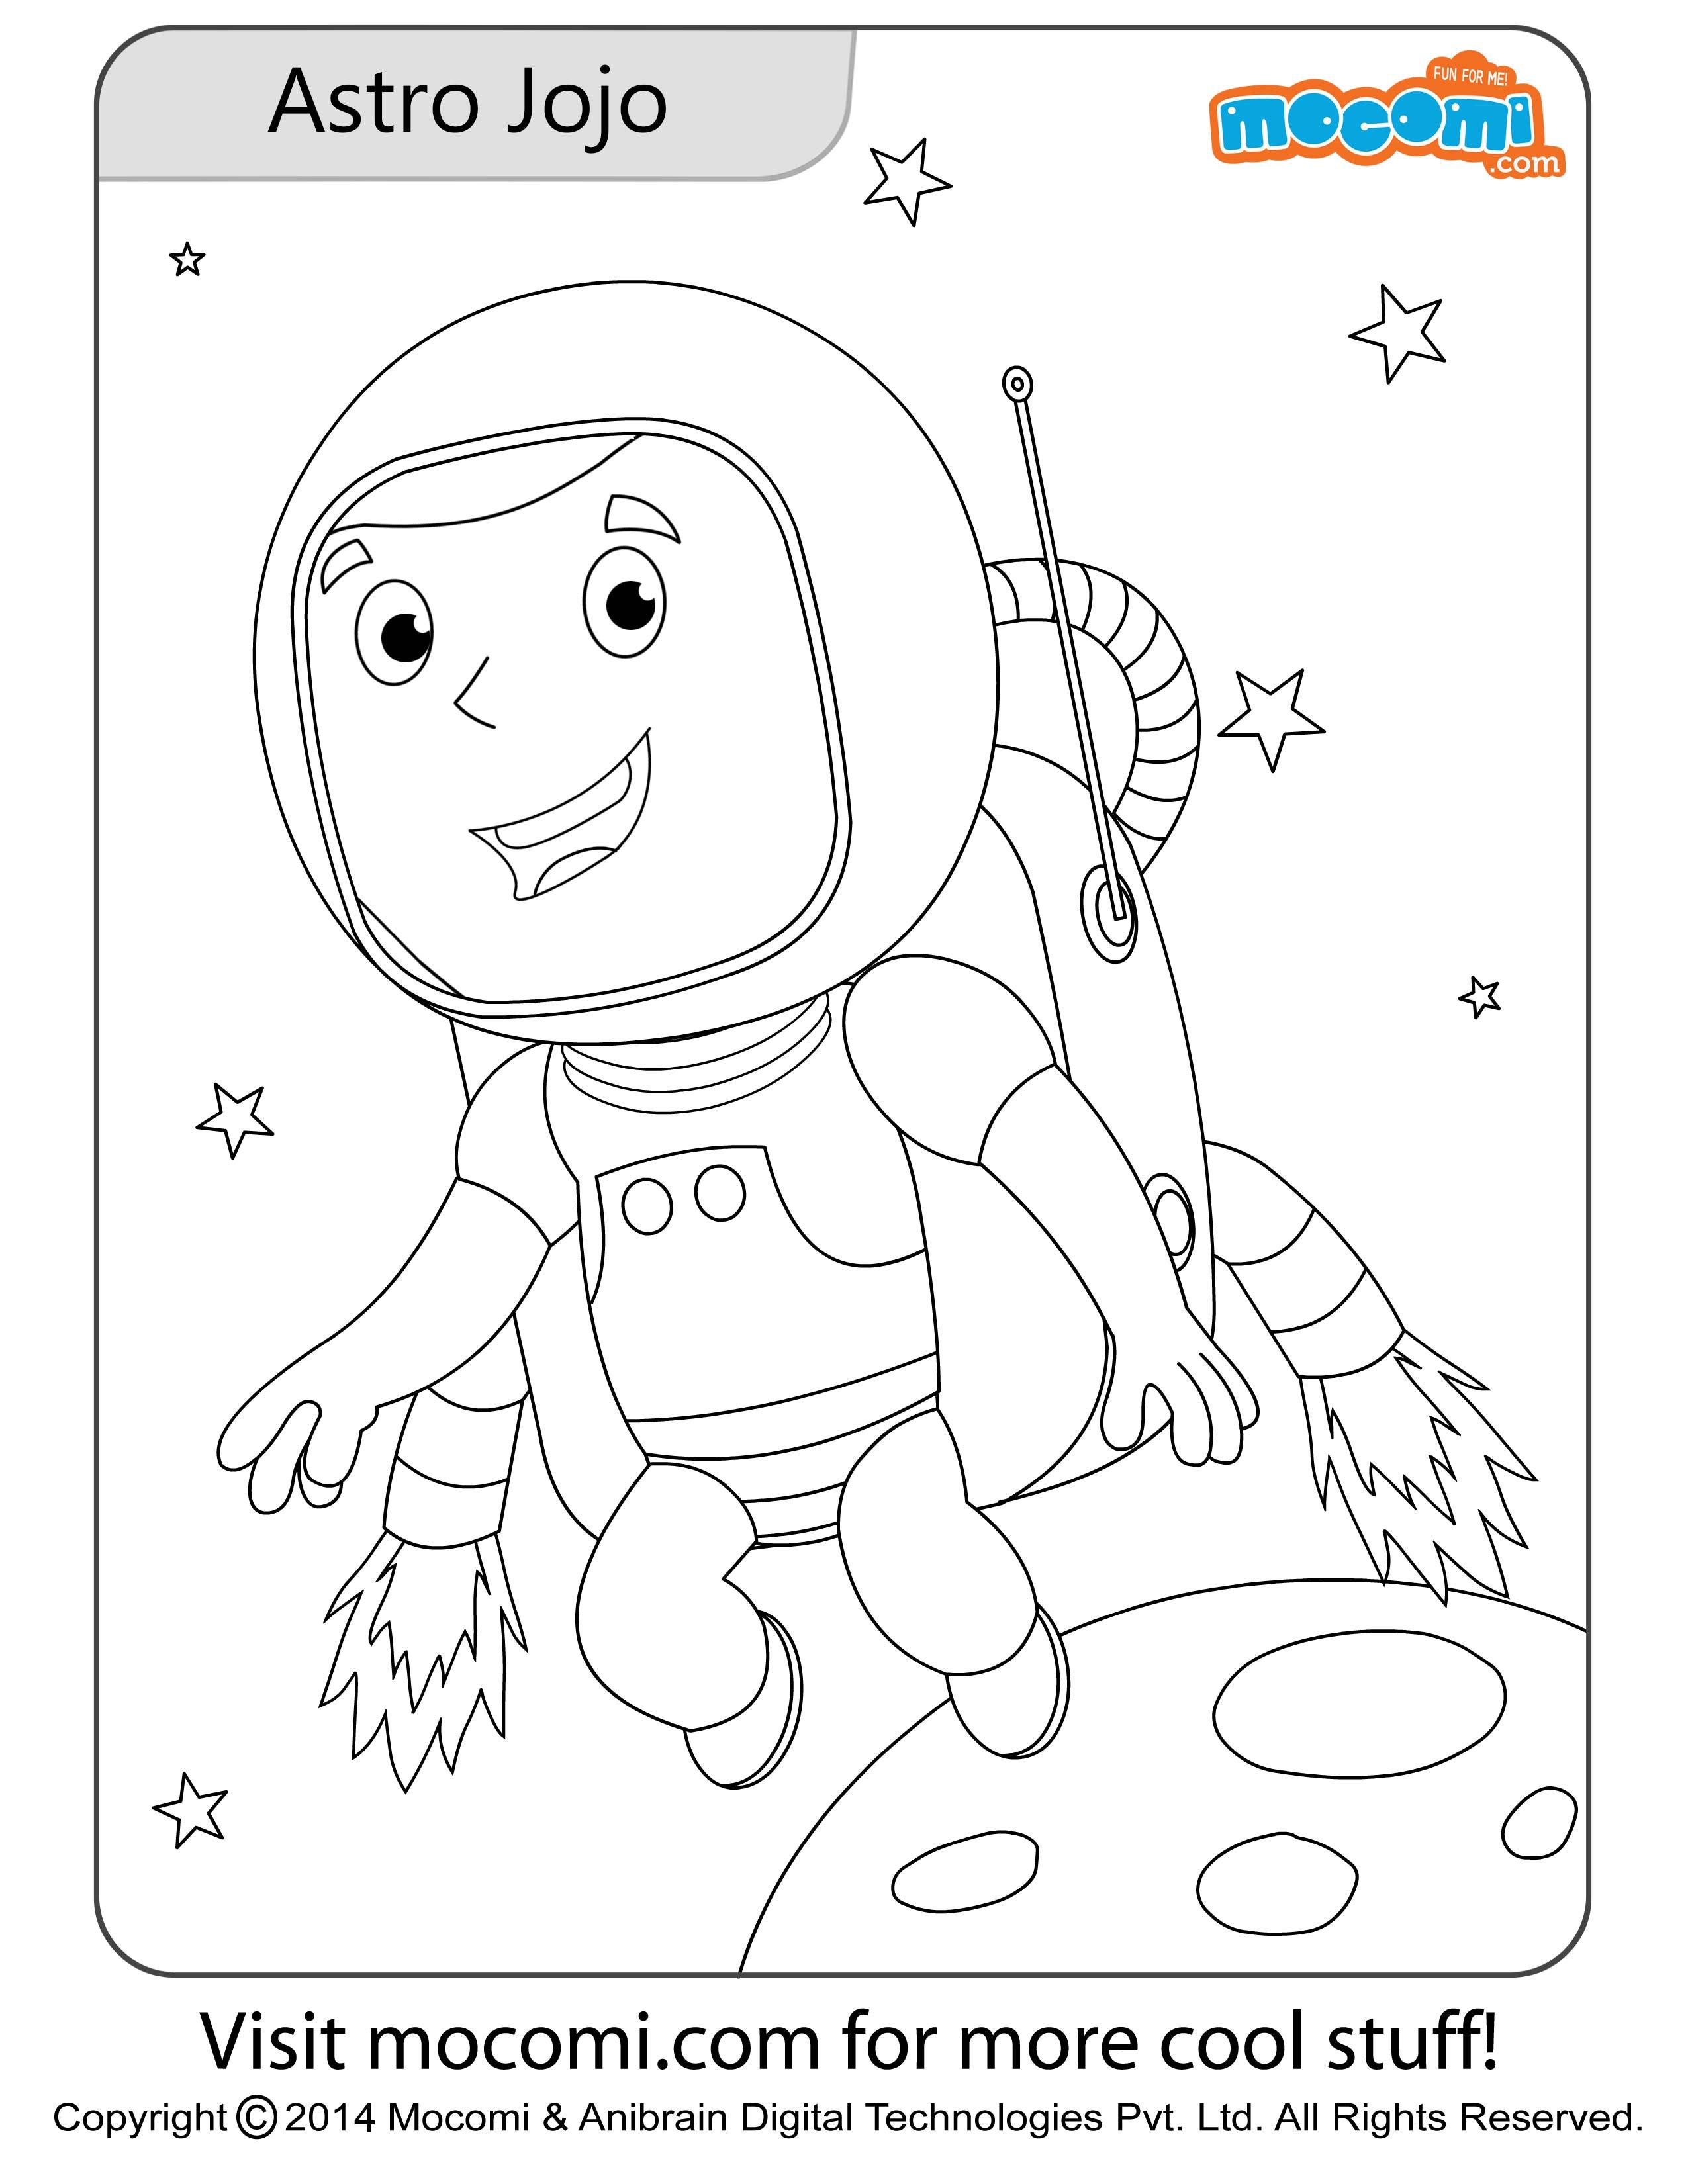 Astronaut Jojo Colouring Page